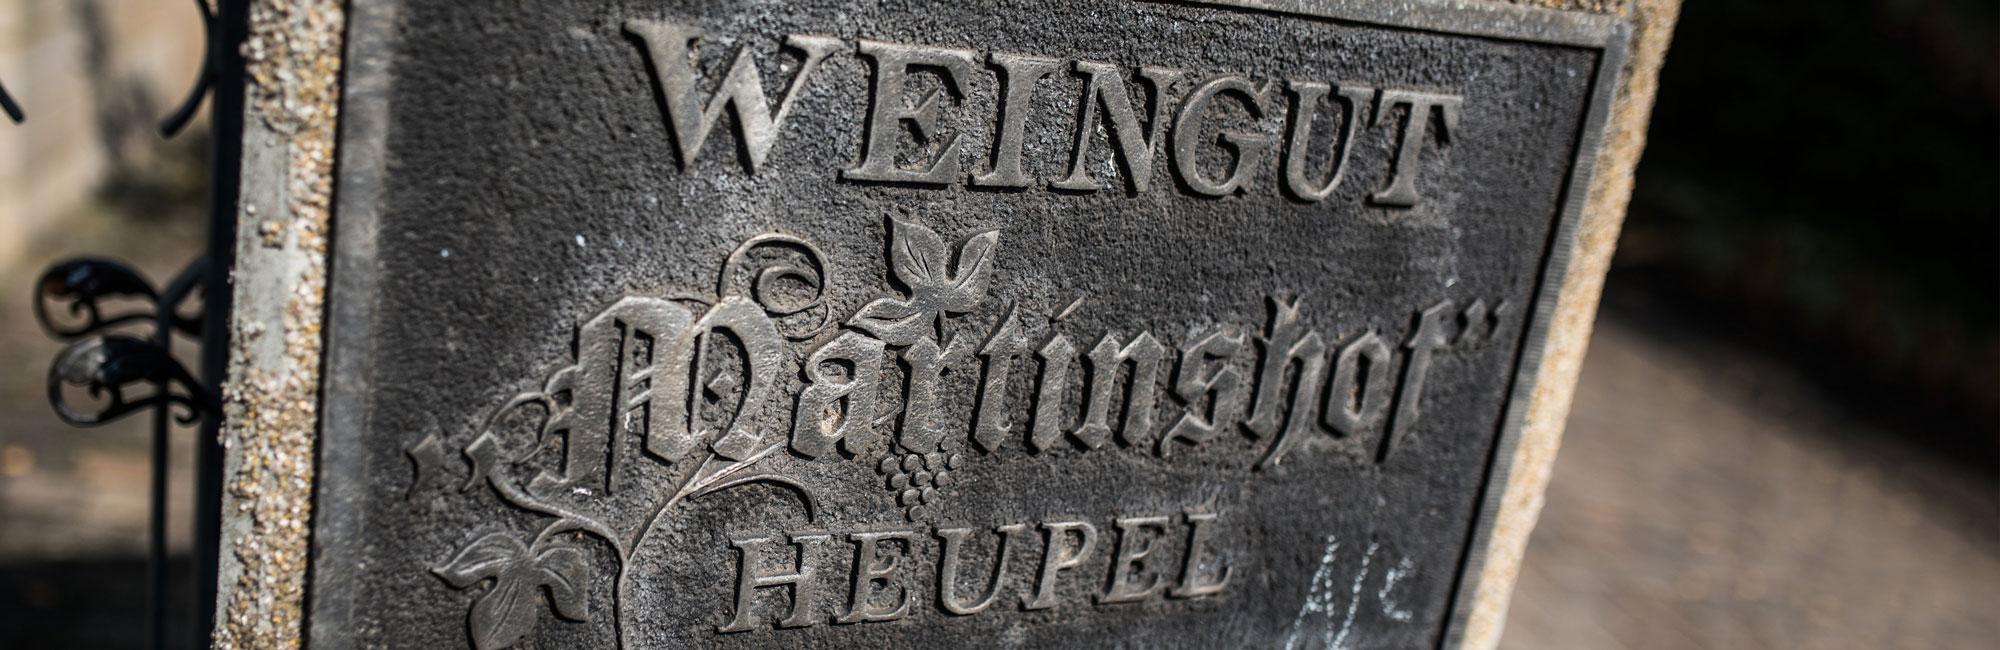 Weingut Martinshof-Heupel Schild